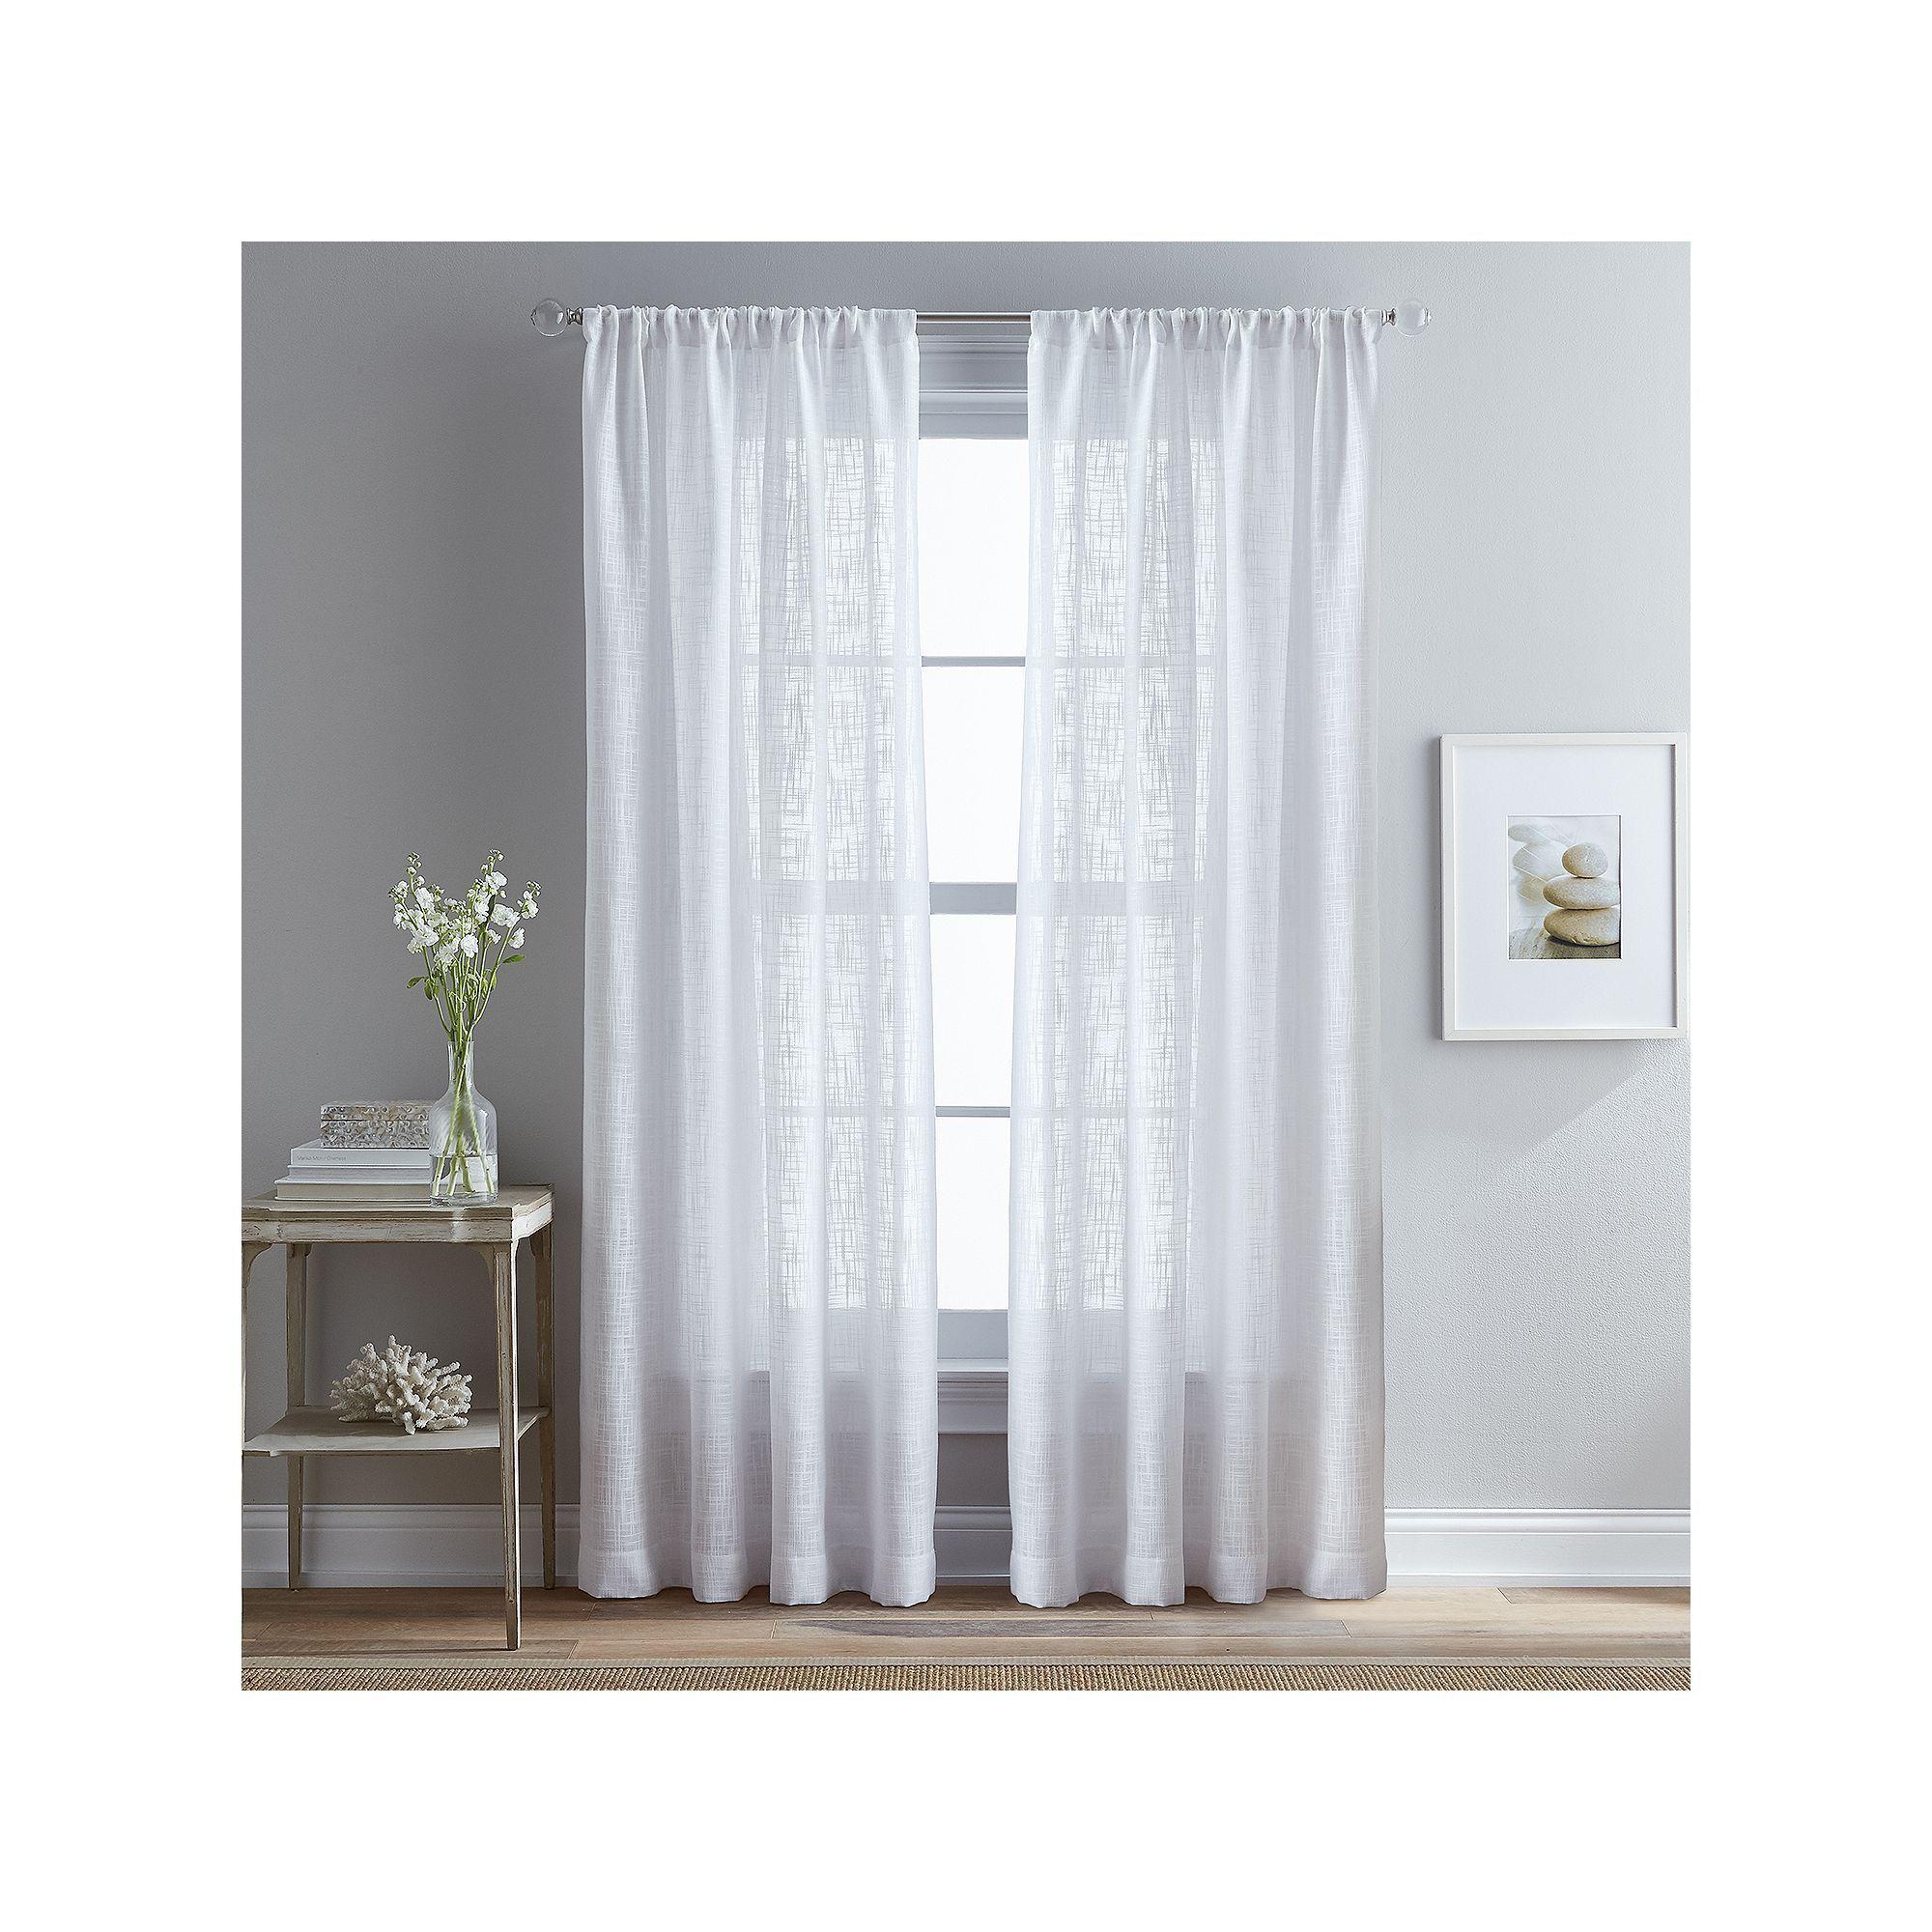 6 Wonderful Diy Ideas Cafe Curtains Ideas Luxury Curtains Modern Double Curtains Shower Curtains Scandinavian Be Cool Curtains Beige Curtains Cottage Curtains